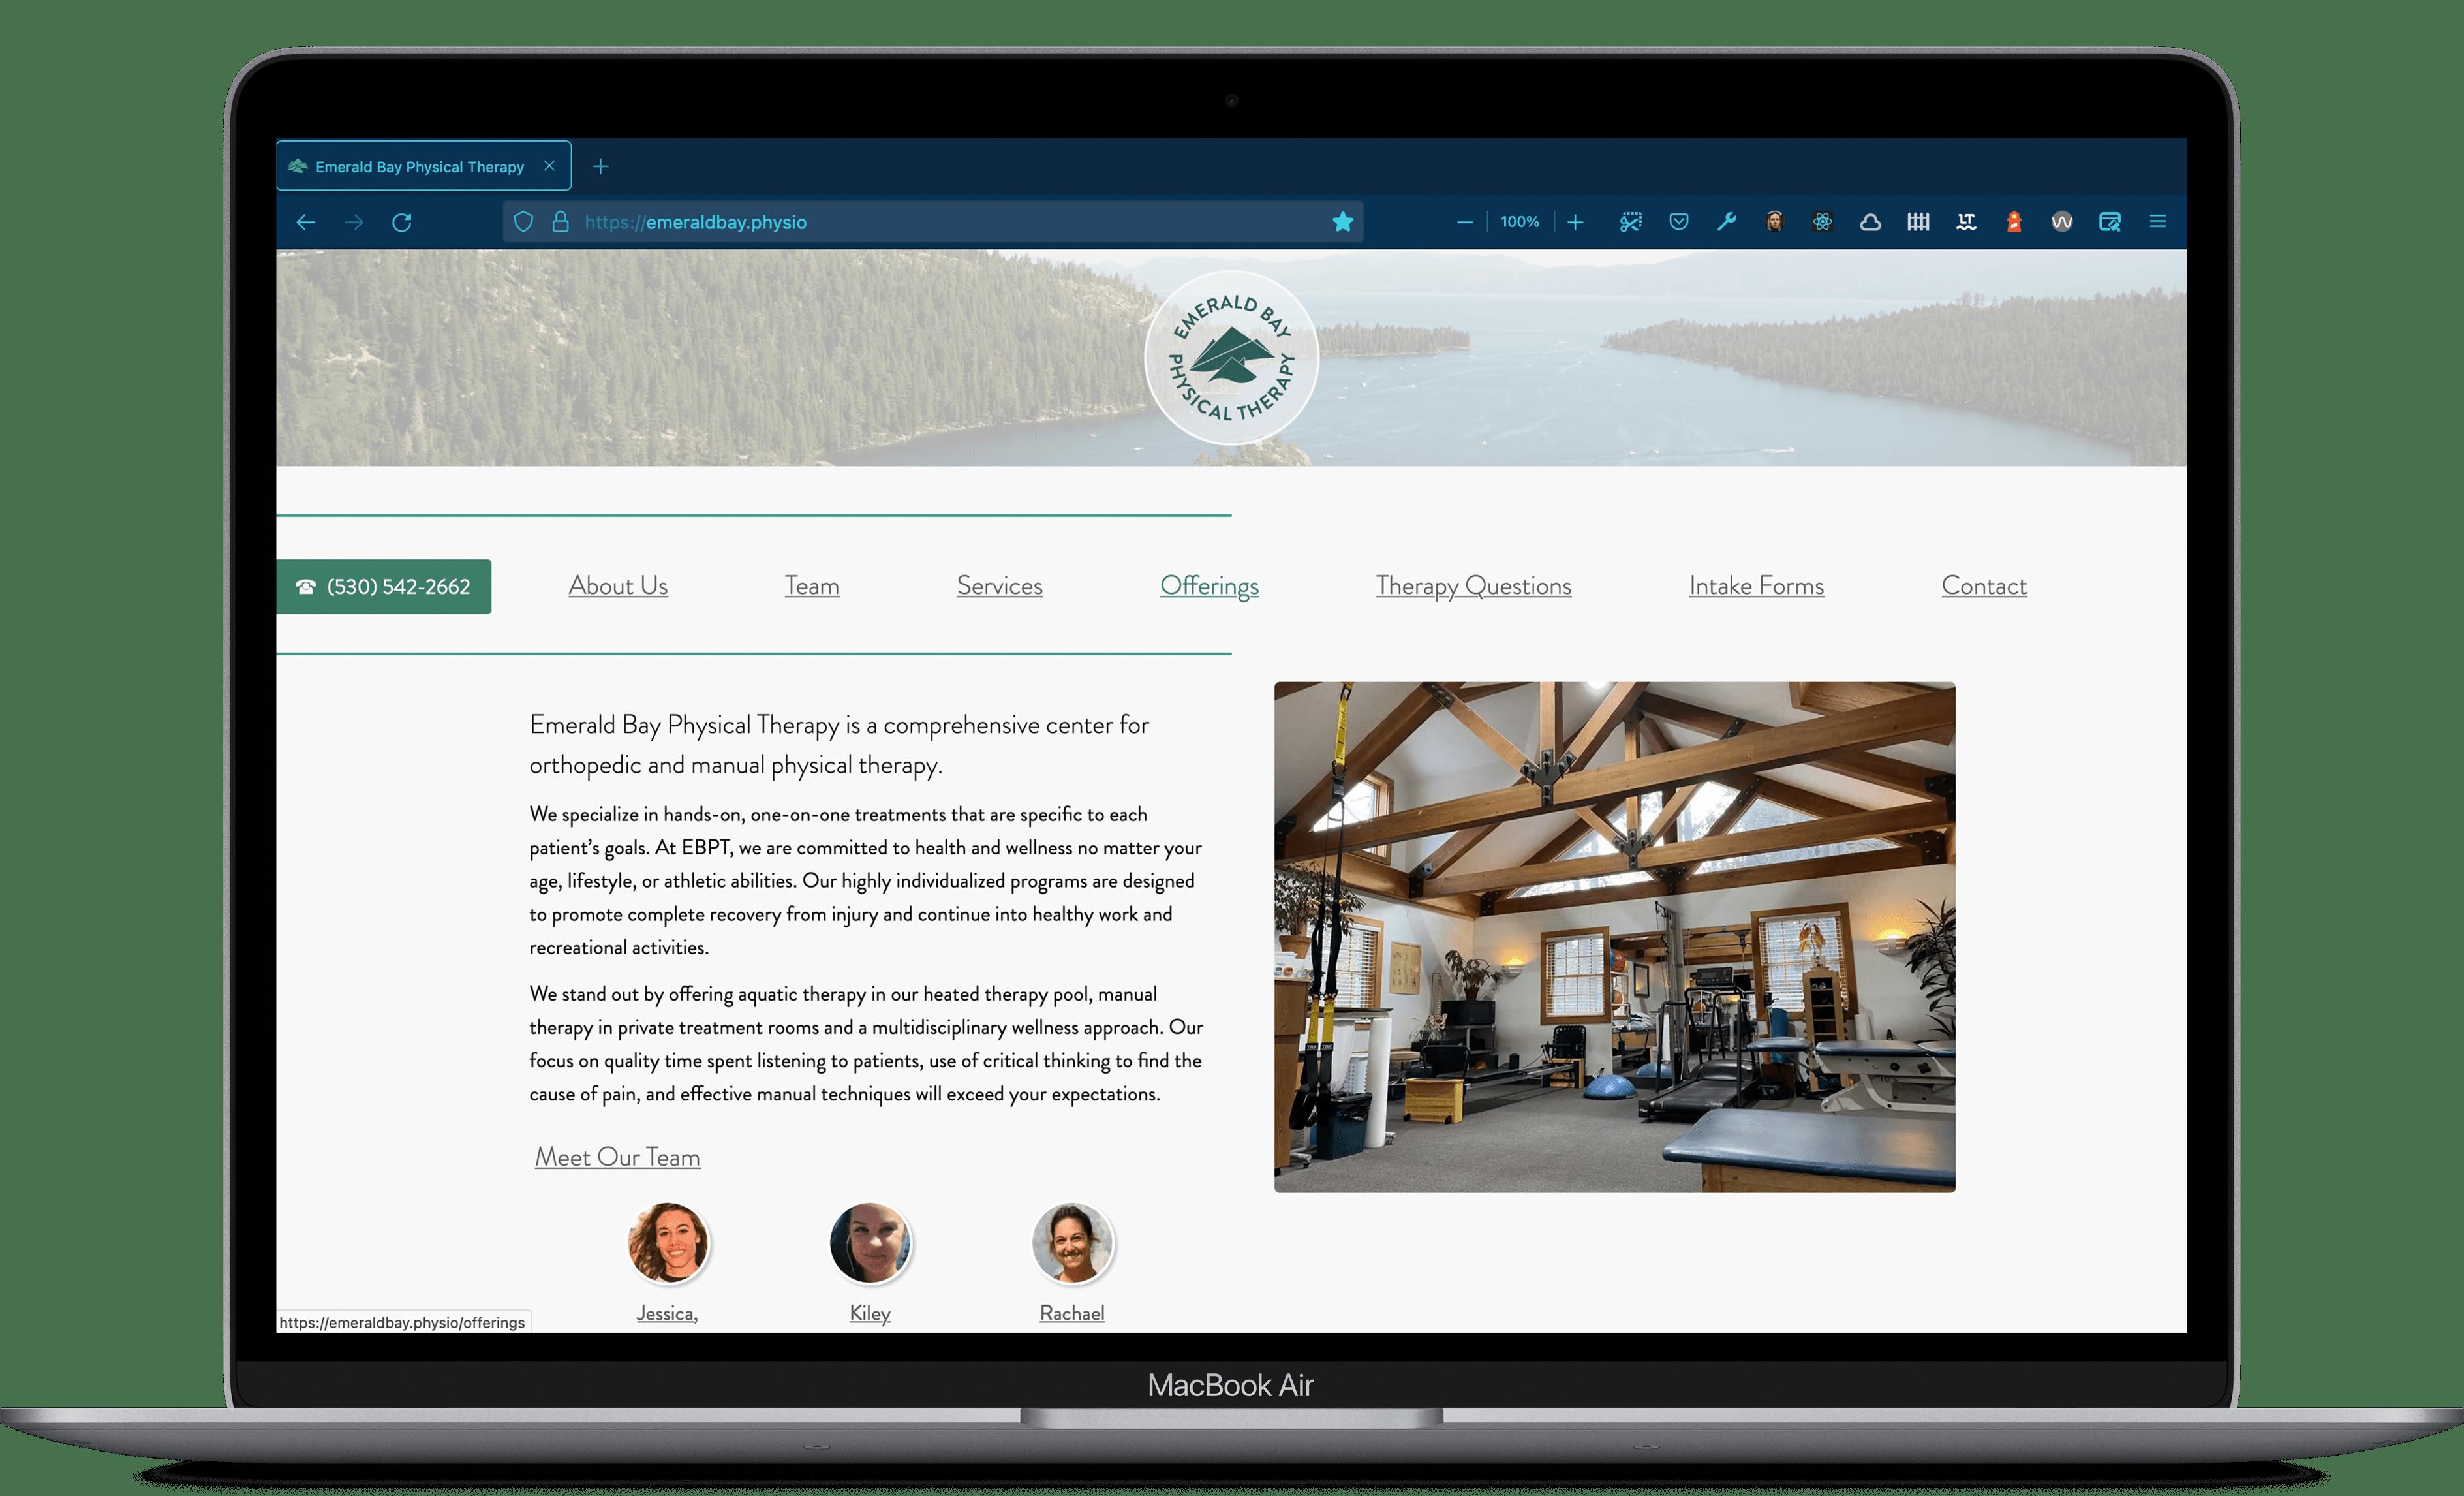 emeraldbay.physio website being displayed on a MacBook Air